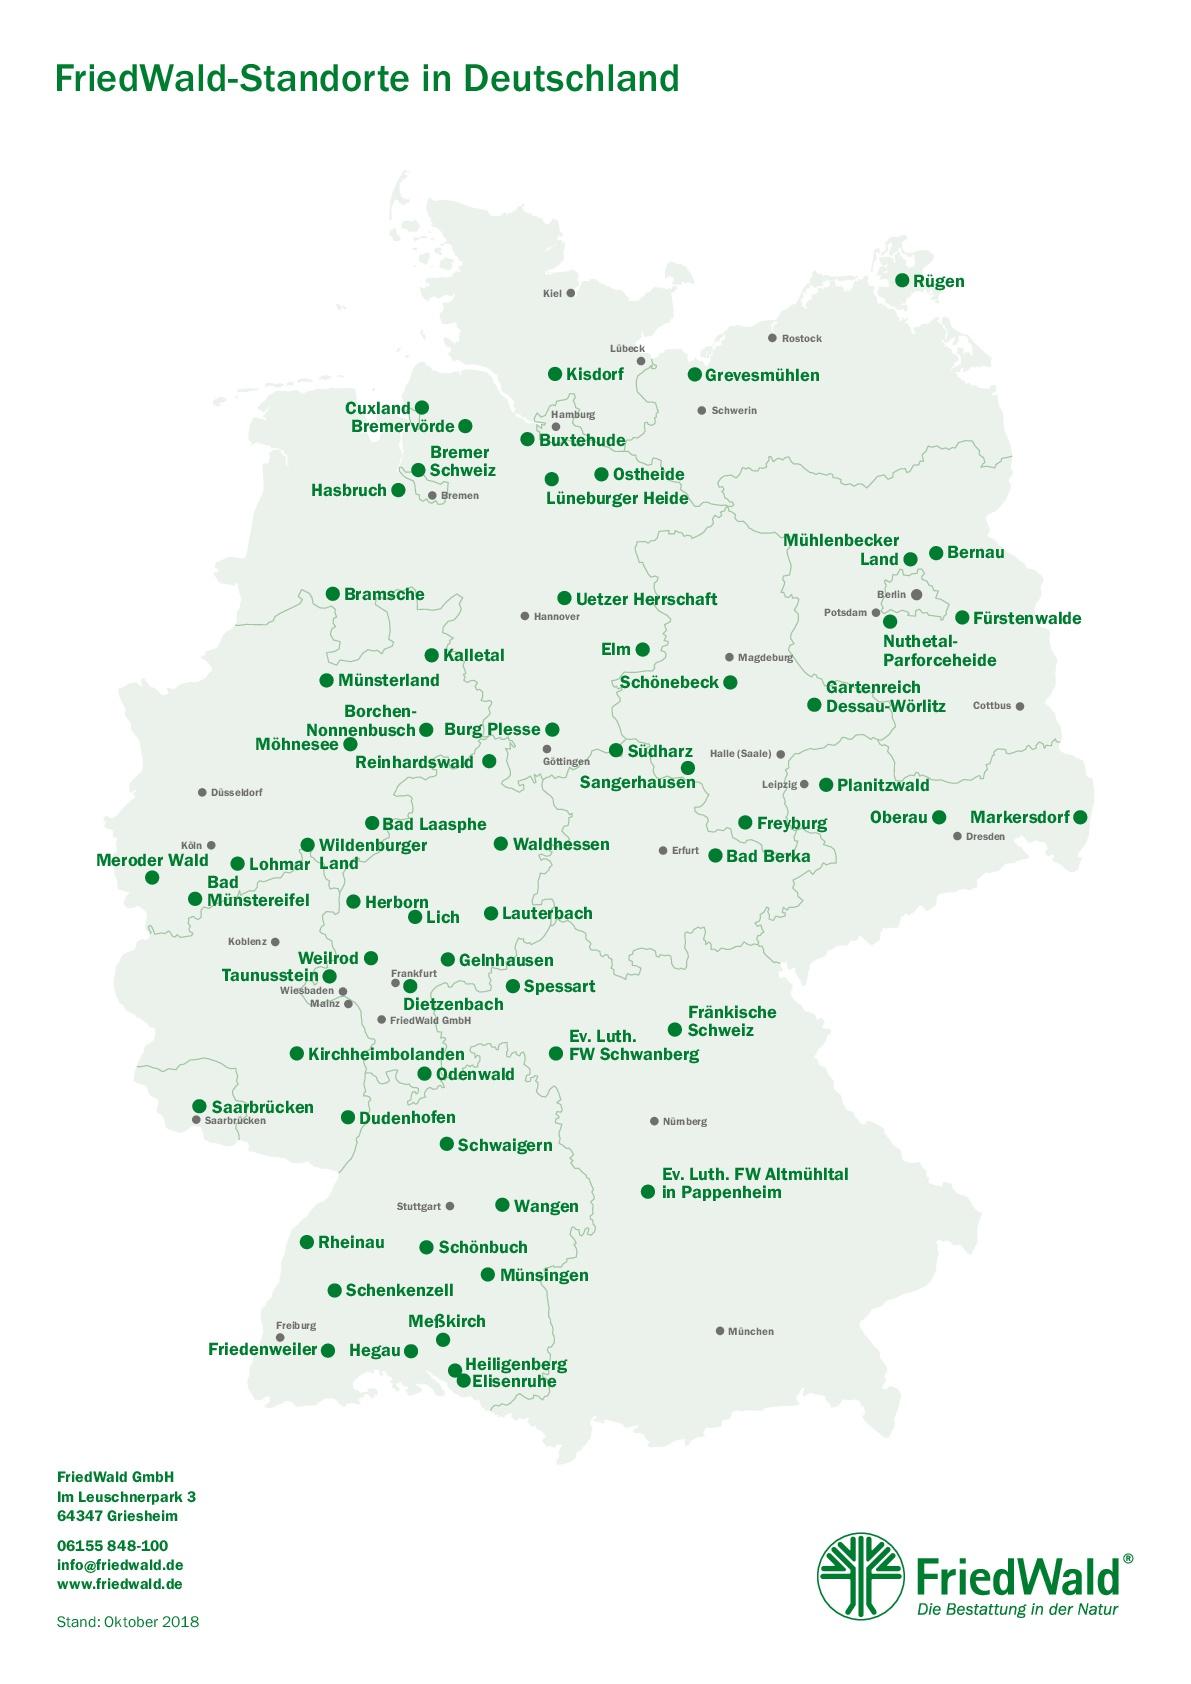 Friedwald Komplettangebot Ab 2299 Anternia Bestattungen